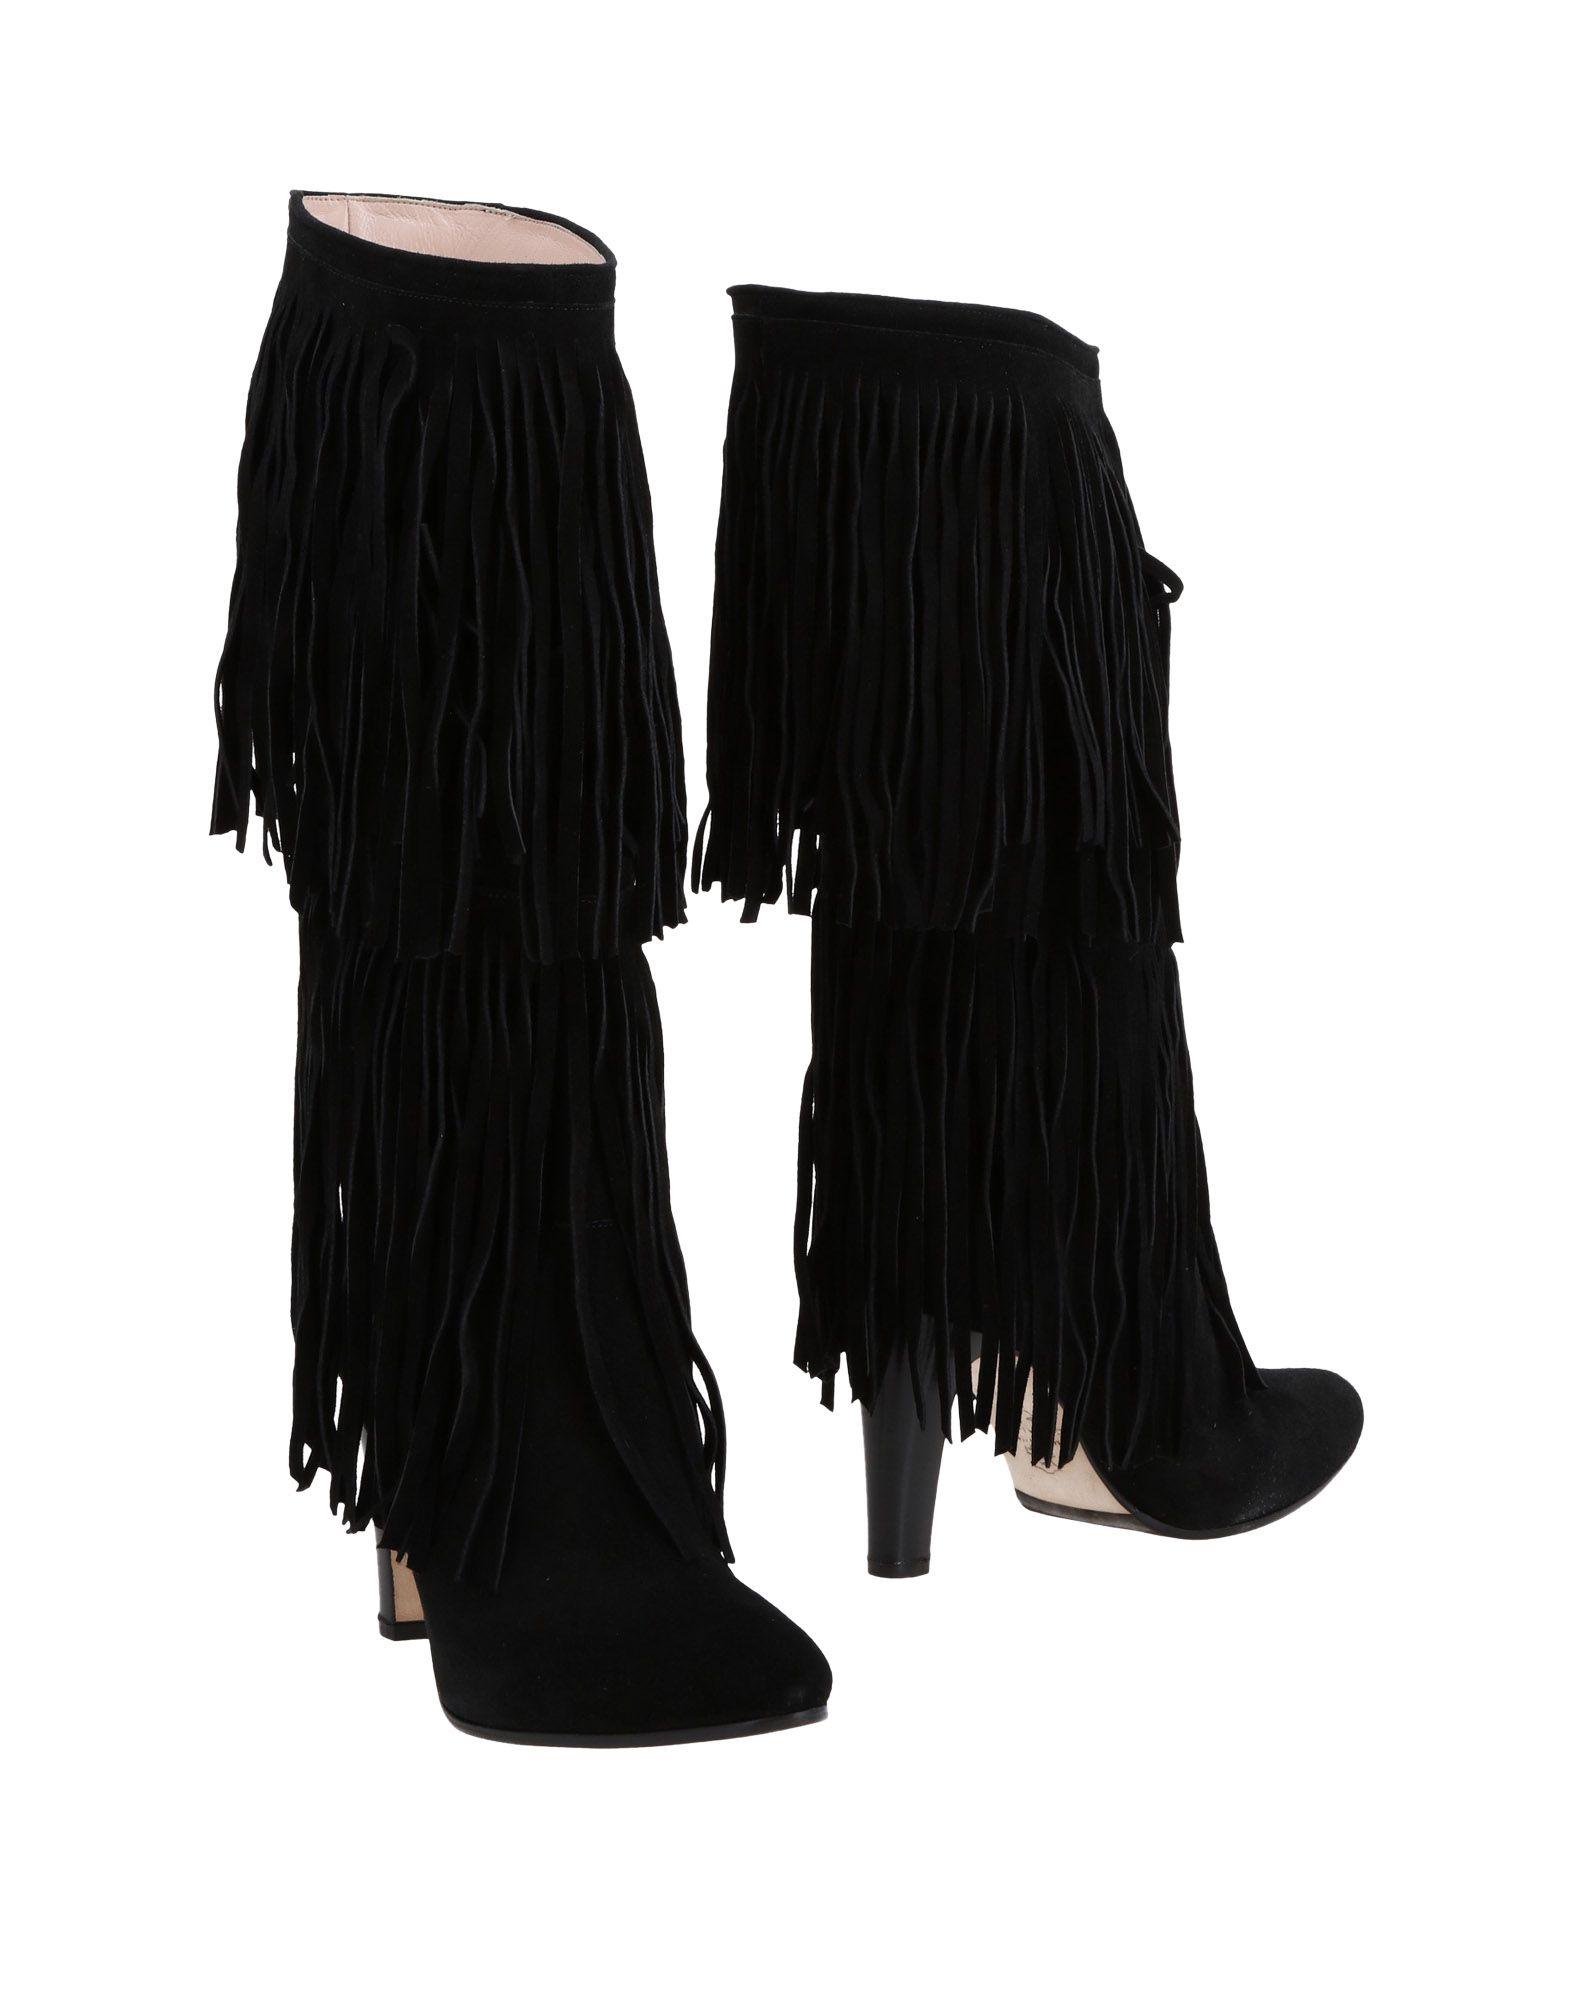 Moda Stivali Cavallini Donna - - Donna 11483172UV 45ddf2